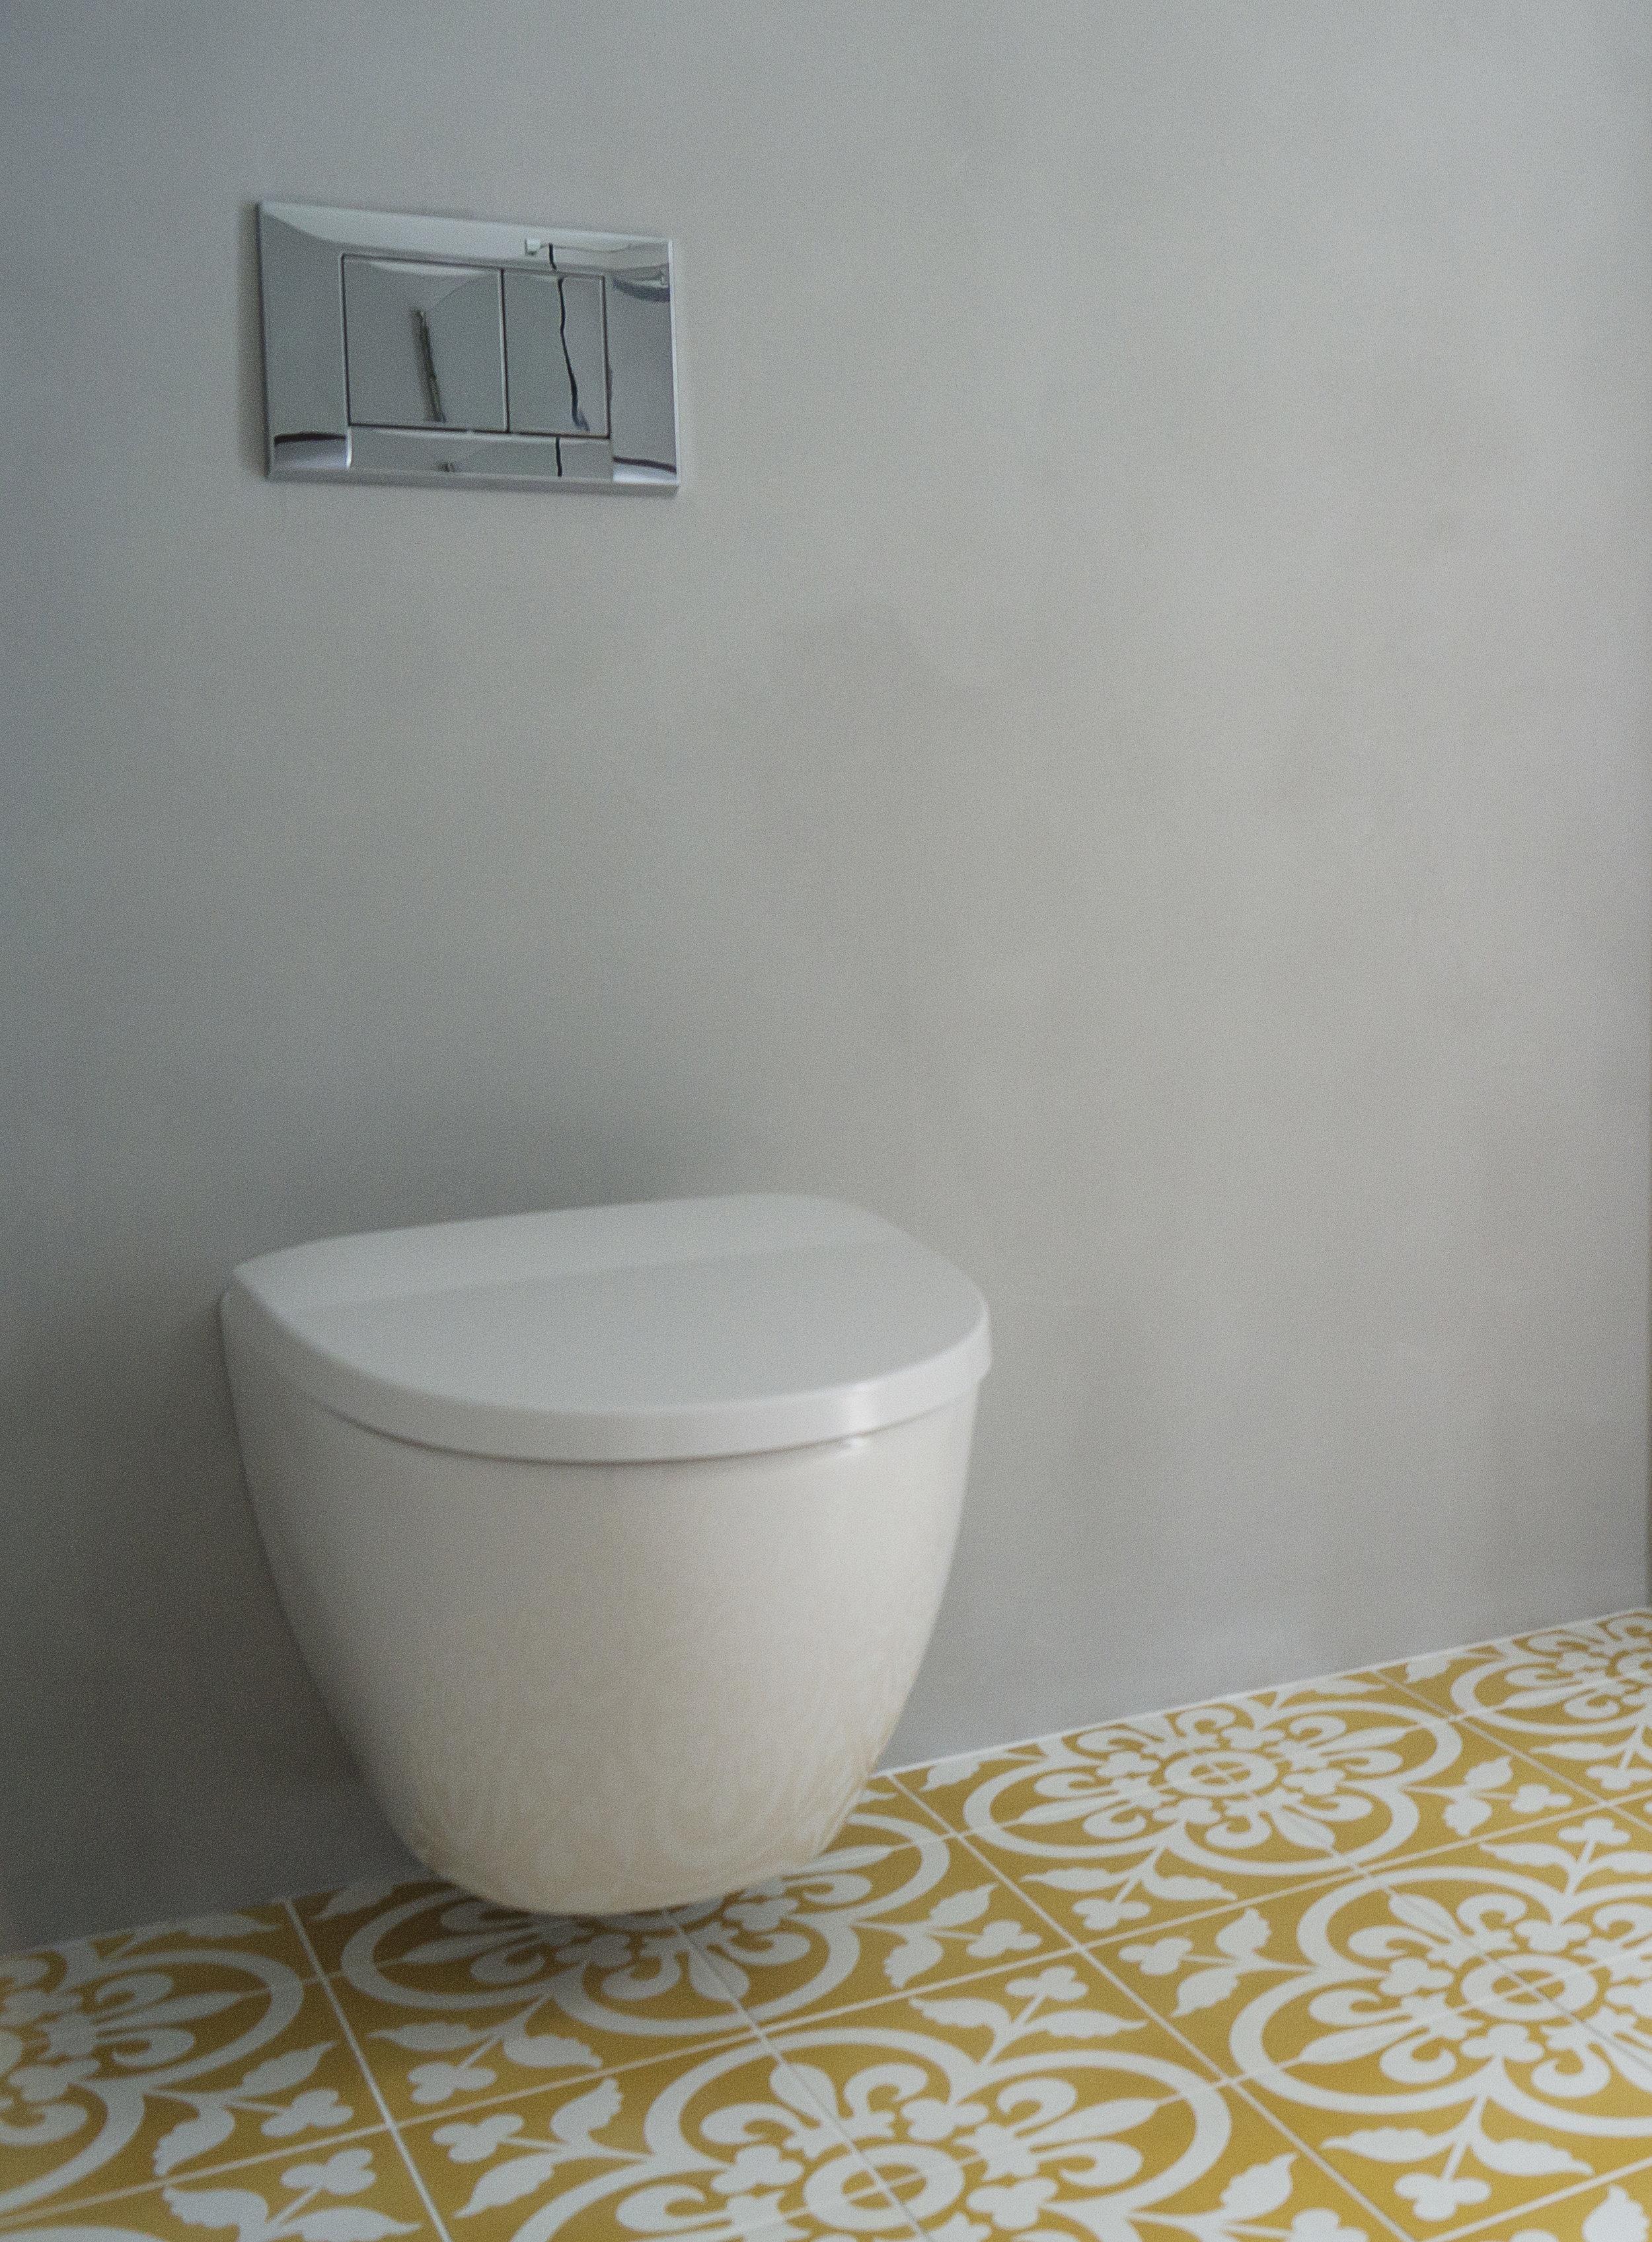 Bad Iris gul pastellone toalett copy.jpg